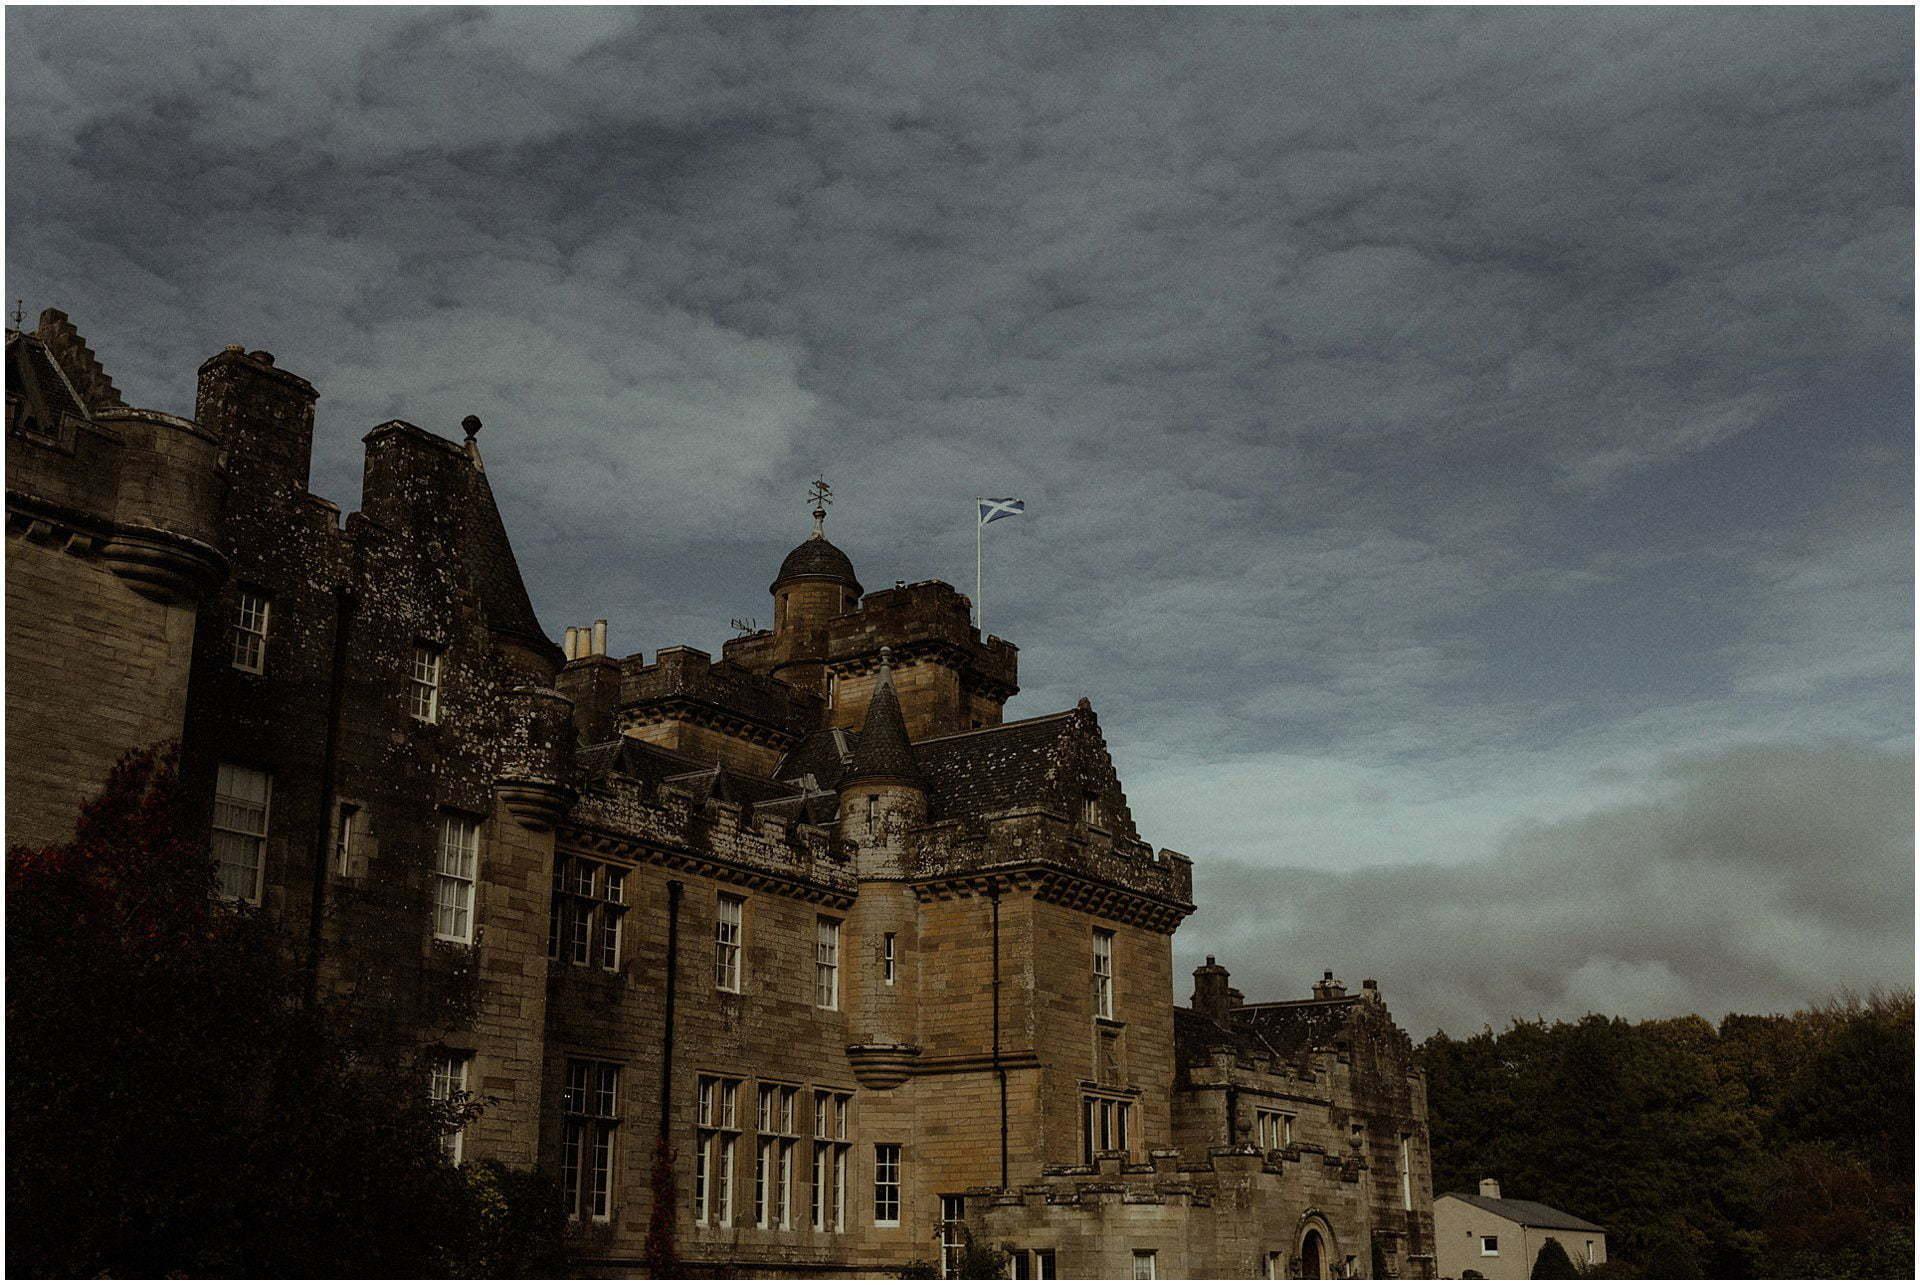 glenapp castle in the autumn